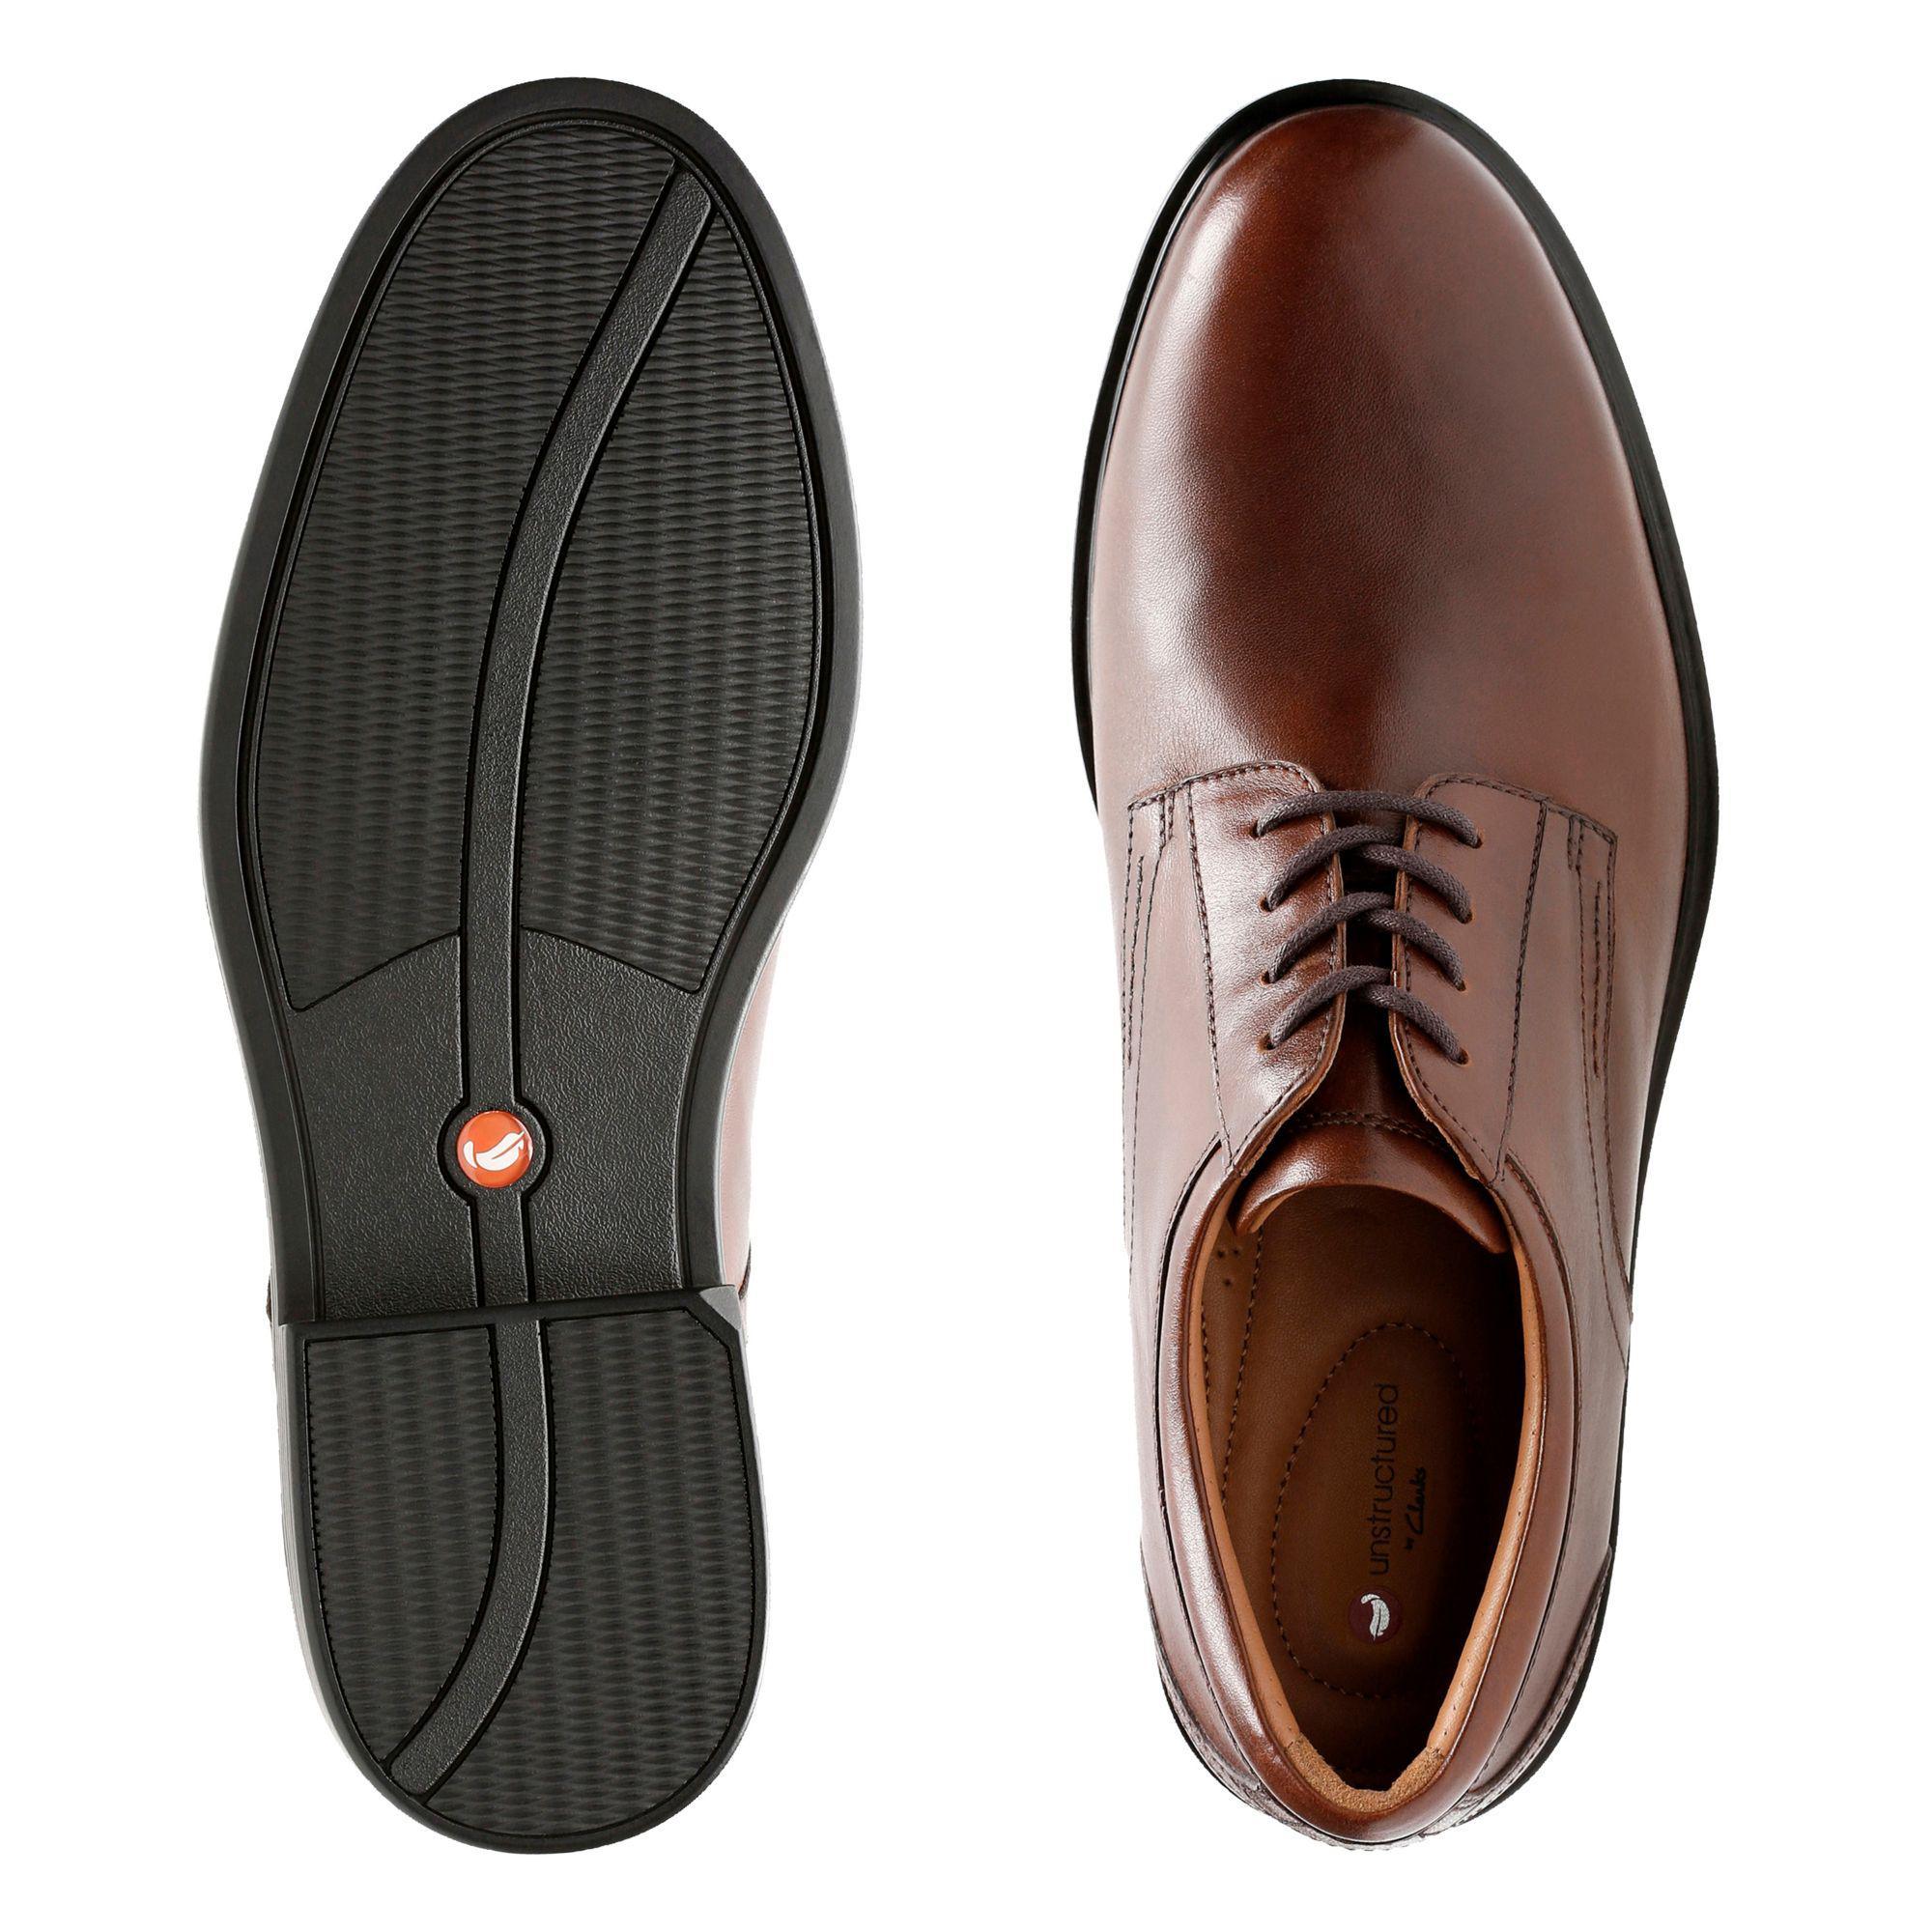 4792c1ccad4 Lyst - Clarks Un Aldric Lace in Brown for Men